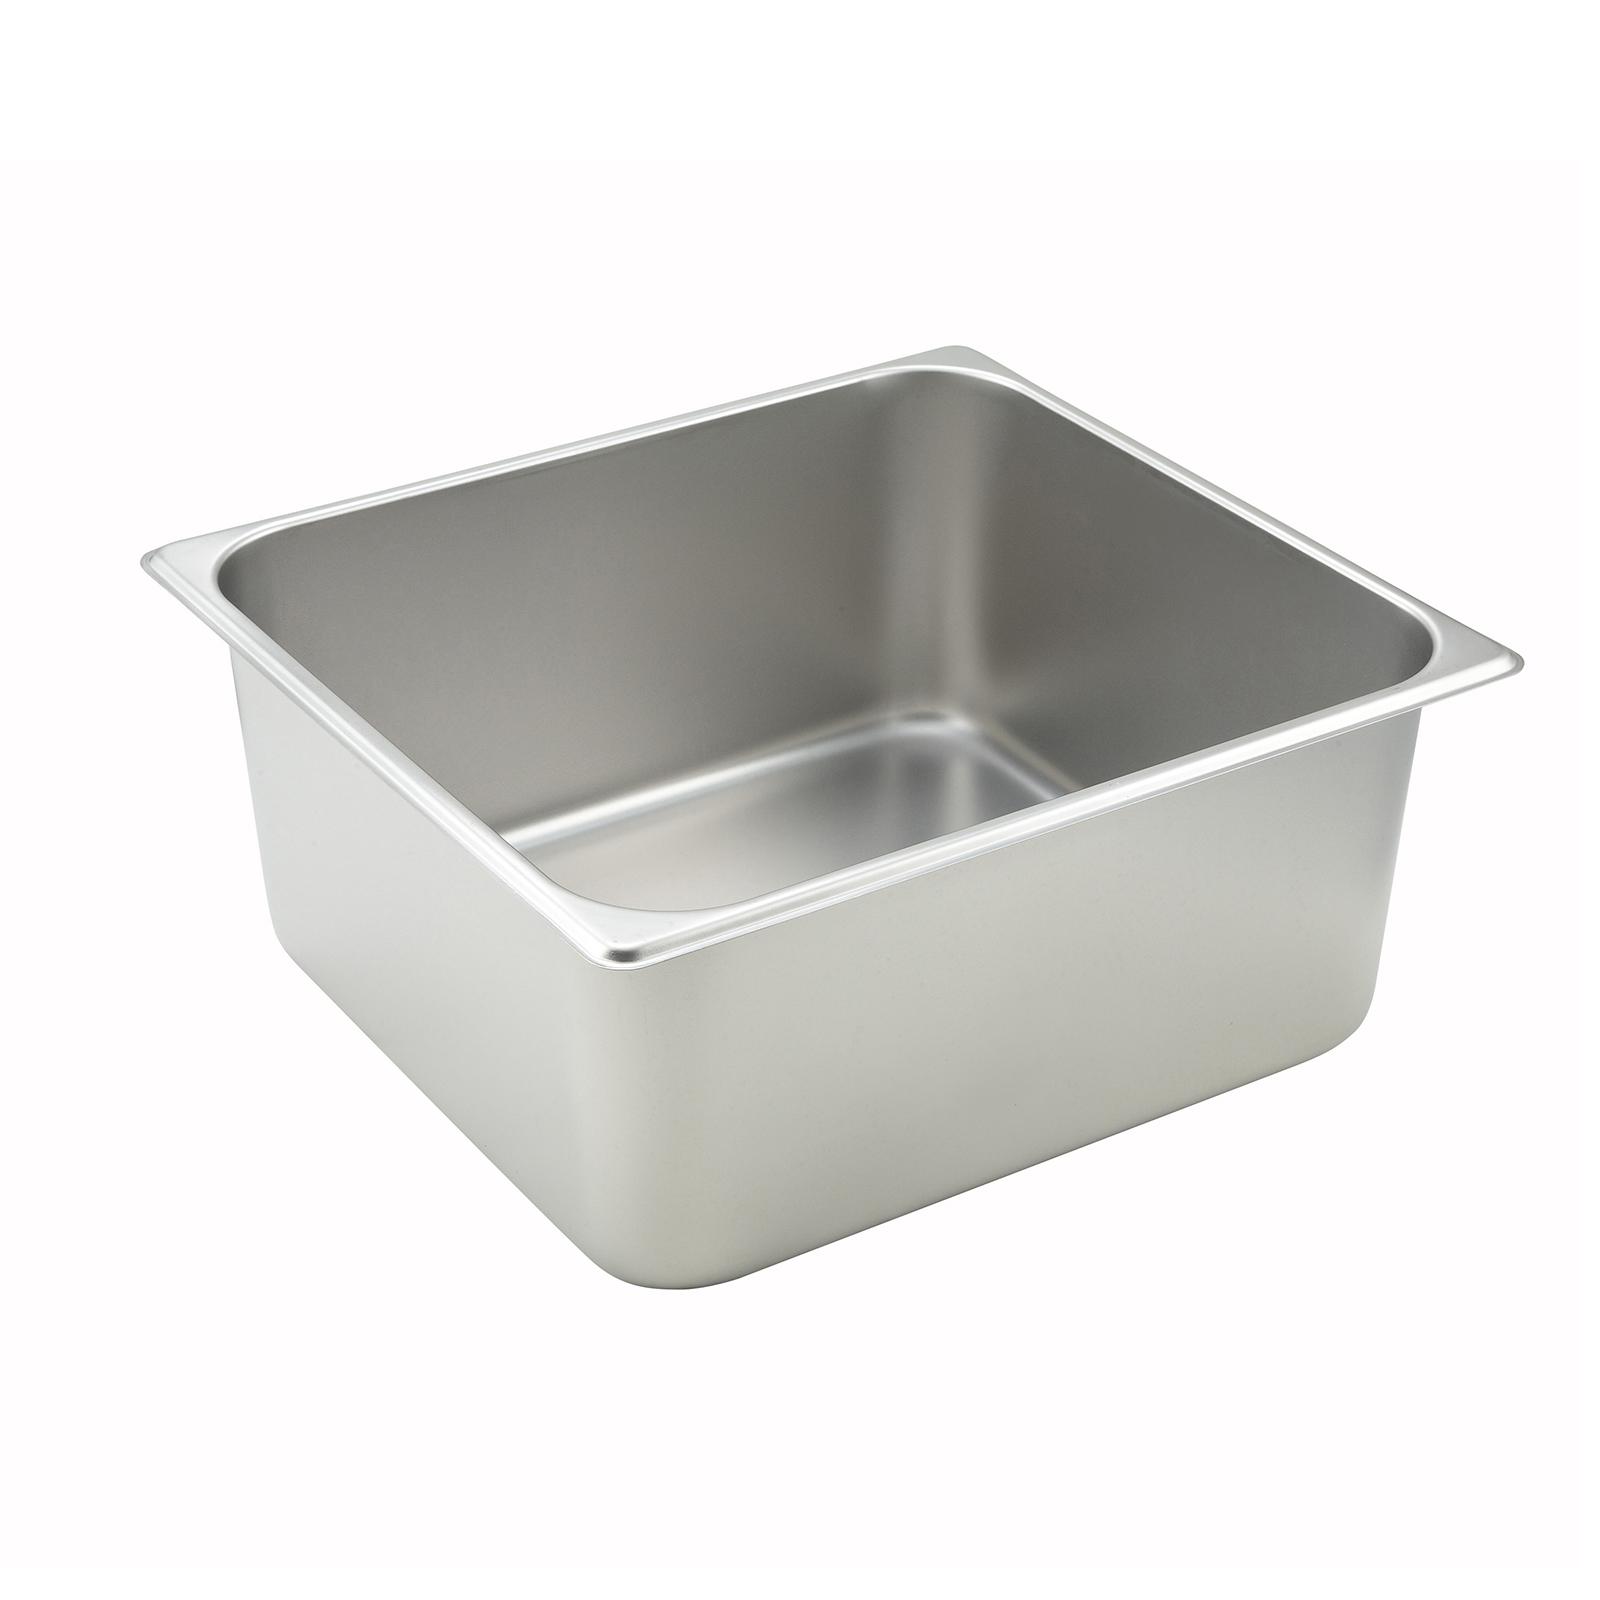 Winco SPTT6 steam table pan, stainless steel